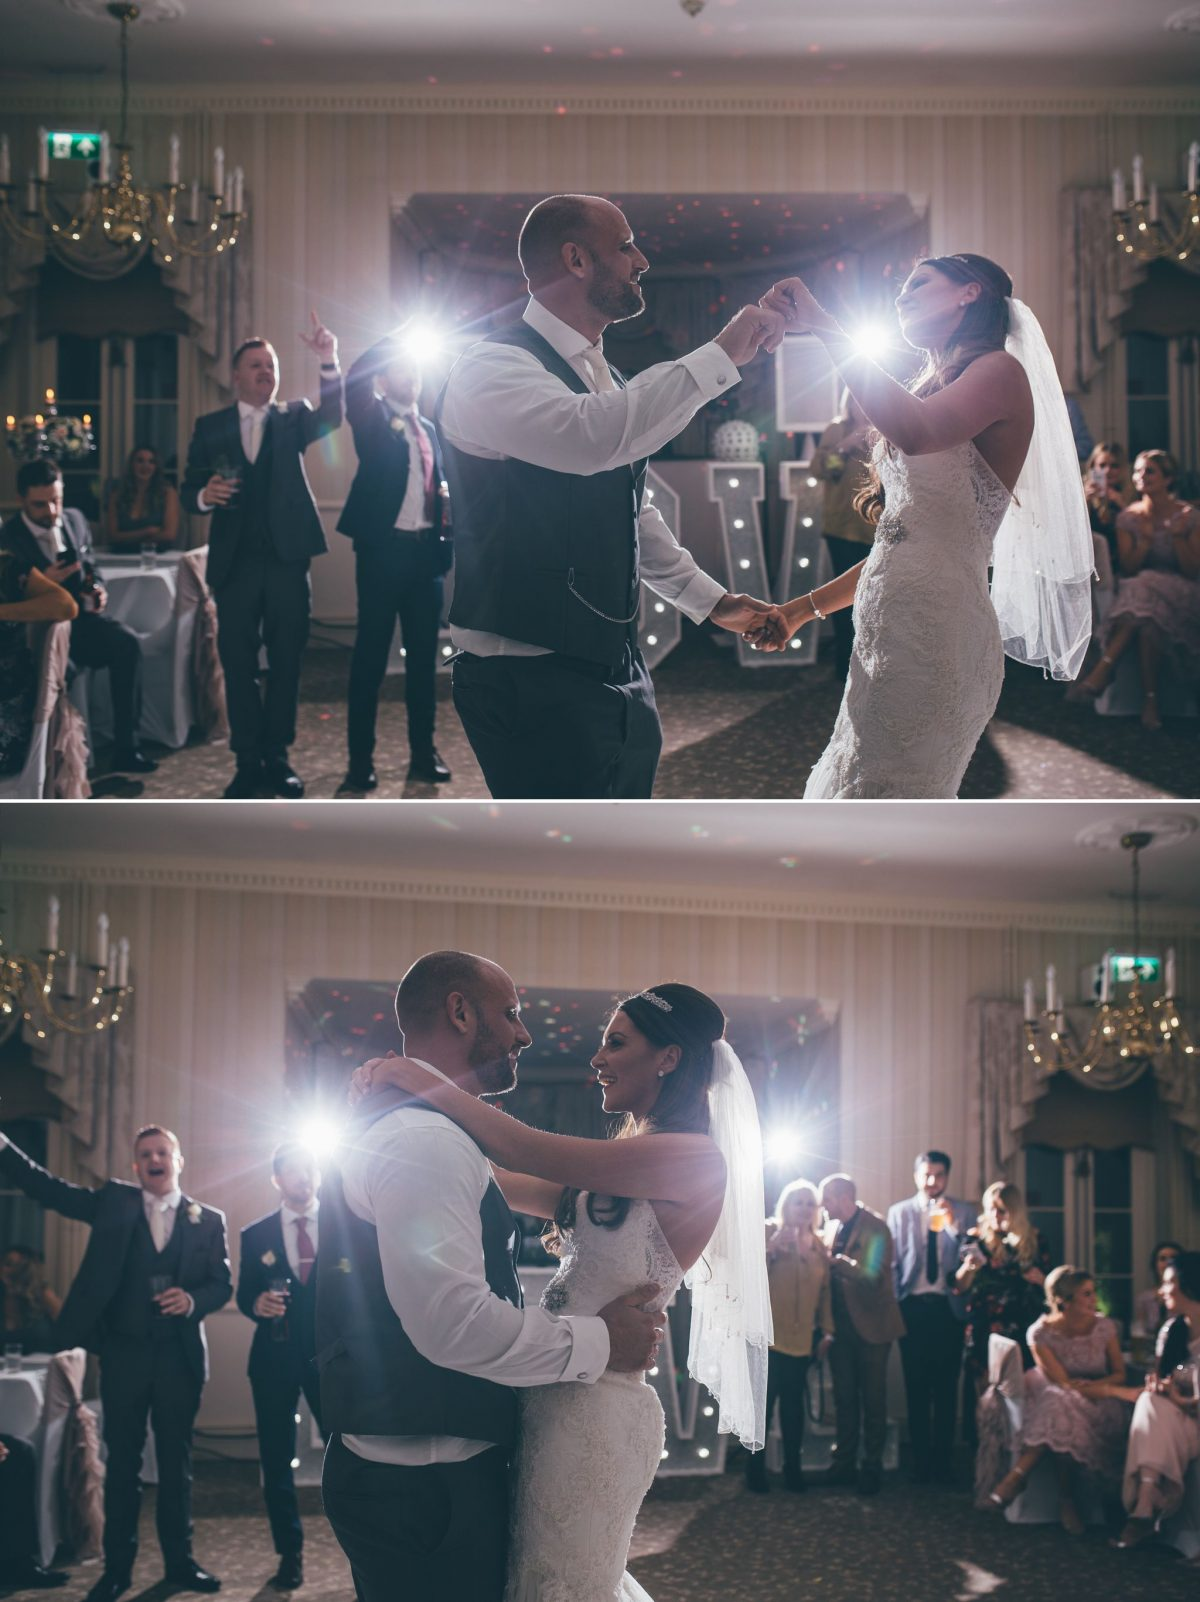 welsh_wedding_photographer_rachel_lambert_photography_decourceys_cardiff_rhiannon_gavin_ 87